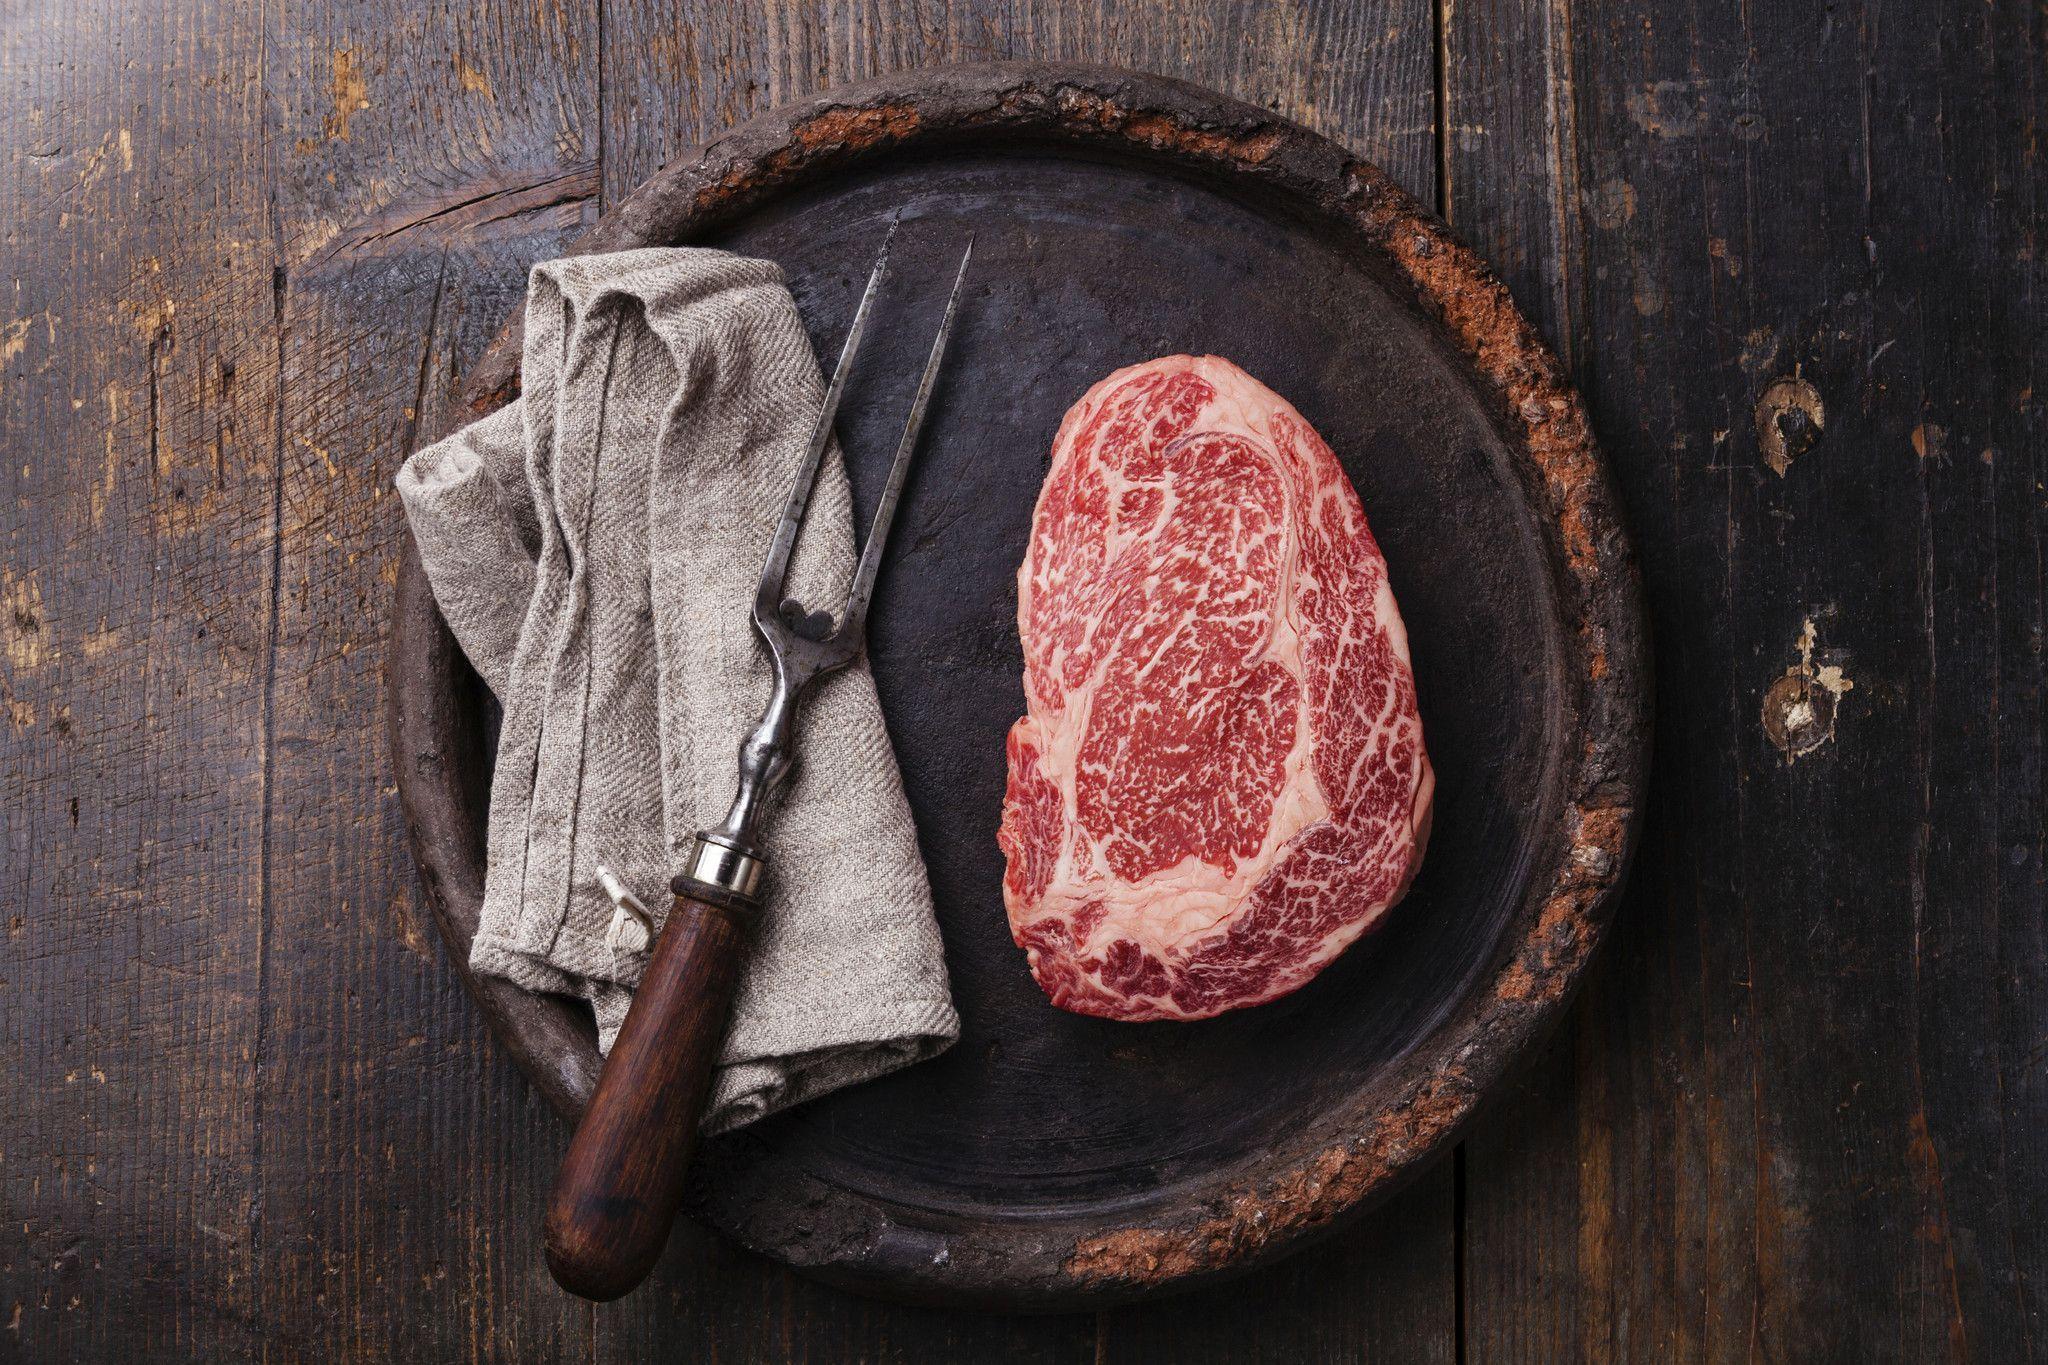 Japanese Wagyu Ribeye In 2020 Wagyu Ribeye Meat Causes Cancer Wagyu Beef